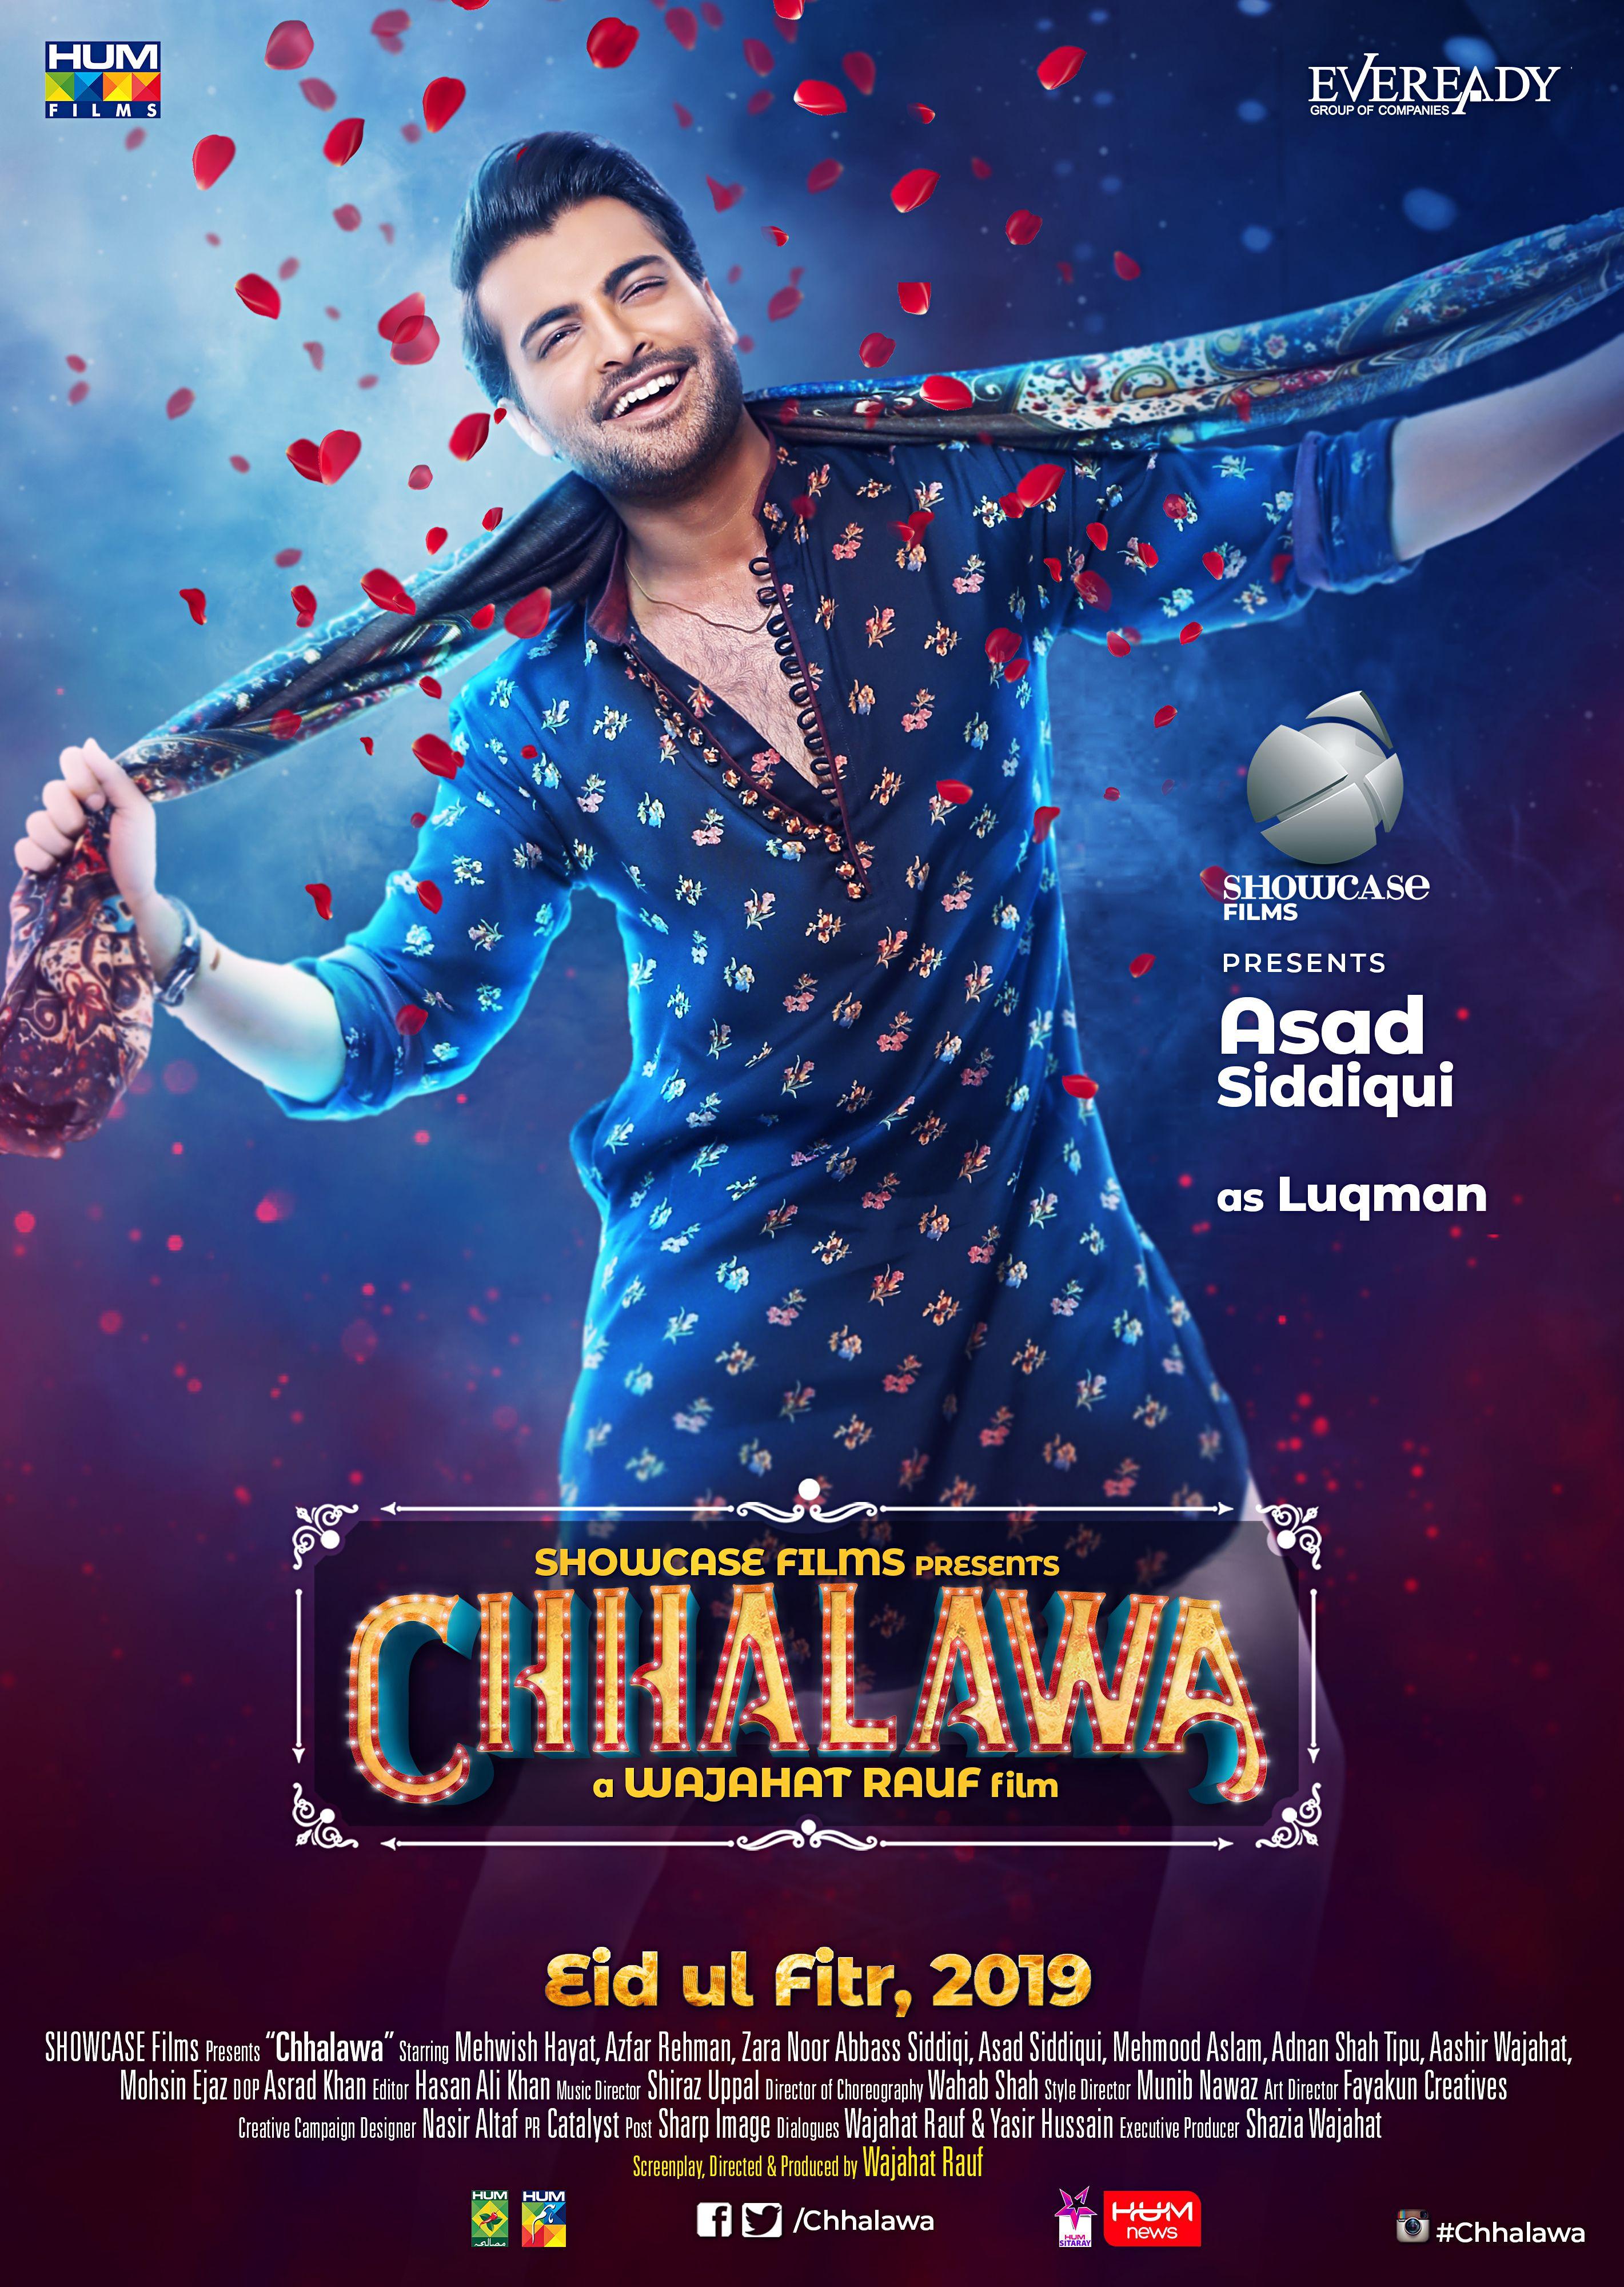 Chhalawa The Movie Asad Siddiqui Movies Film Movie Posters